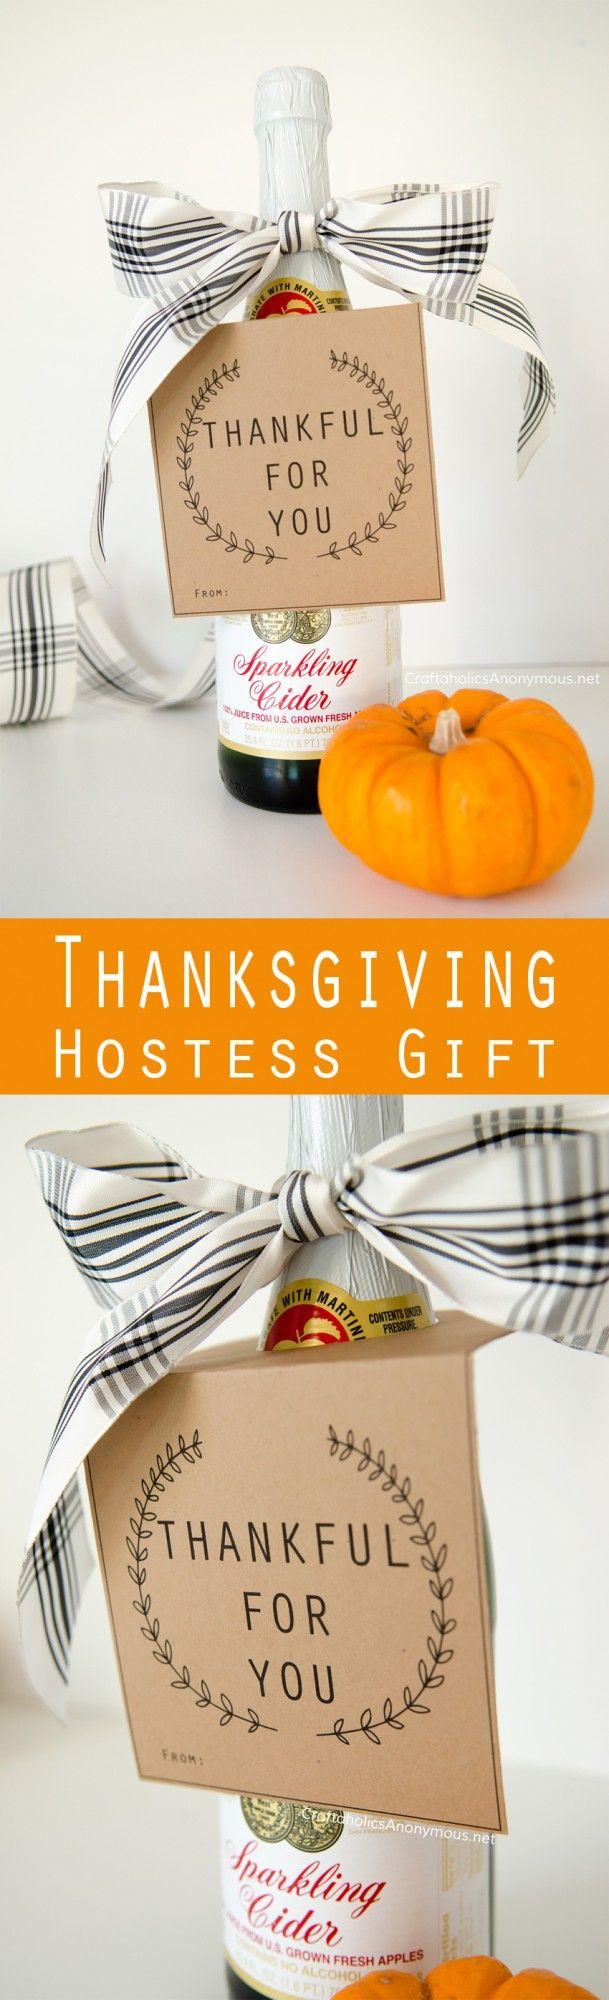 Thanksgiving Hostess Gift Idea :: makes a great Thanksgiving Teachers gift idea as well